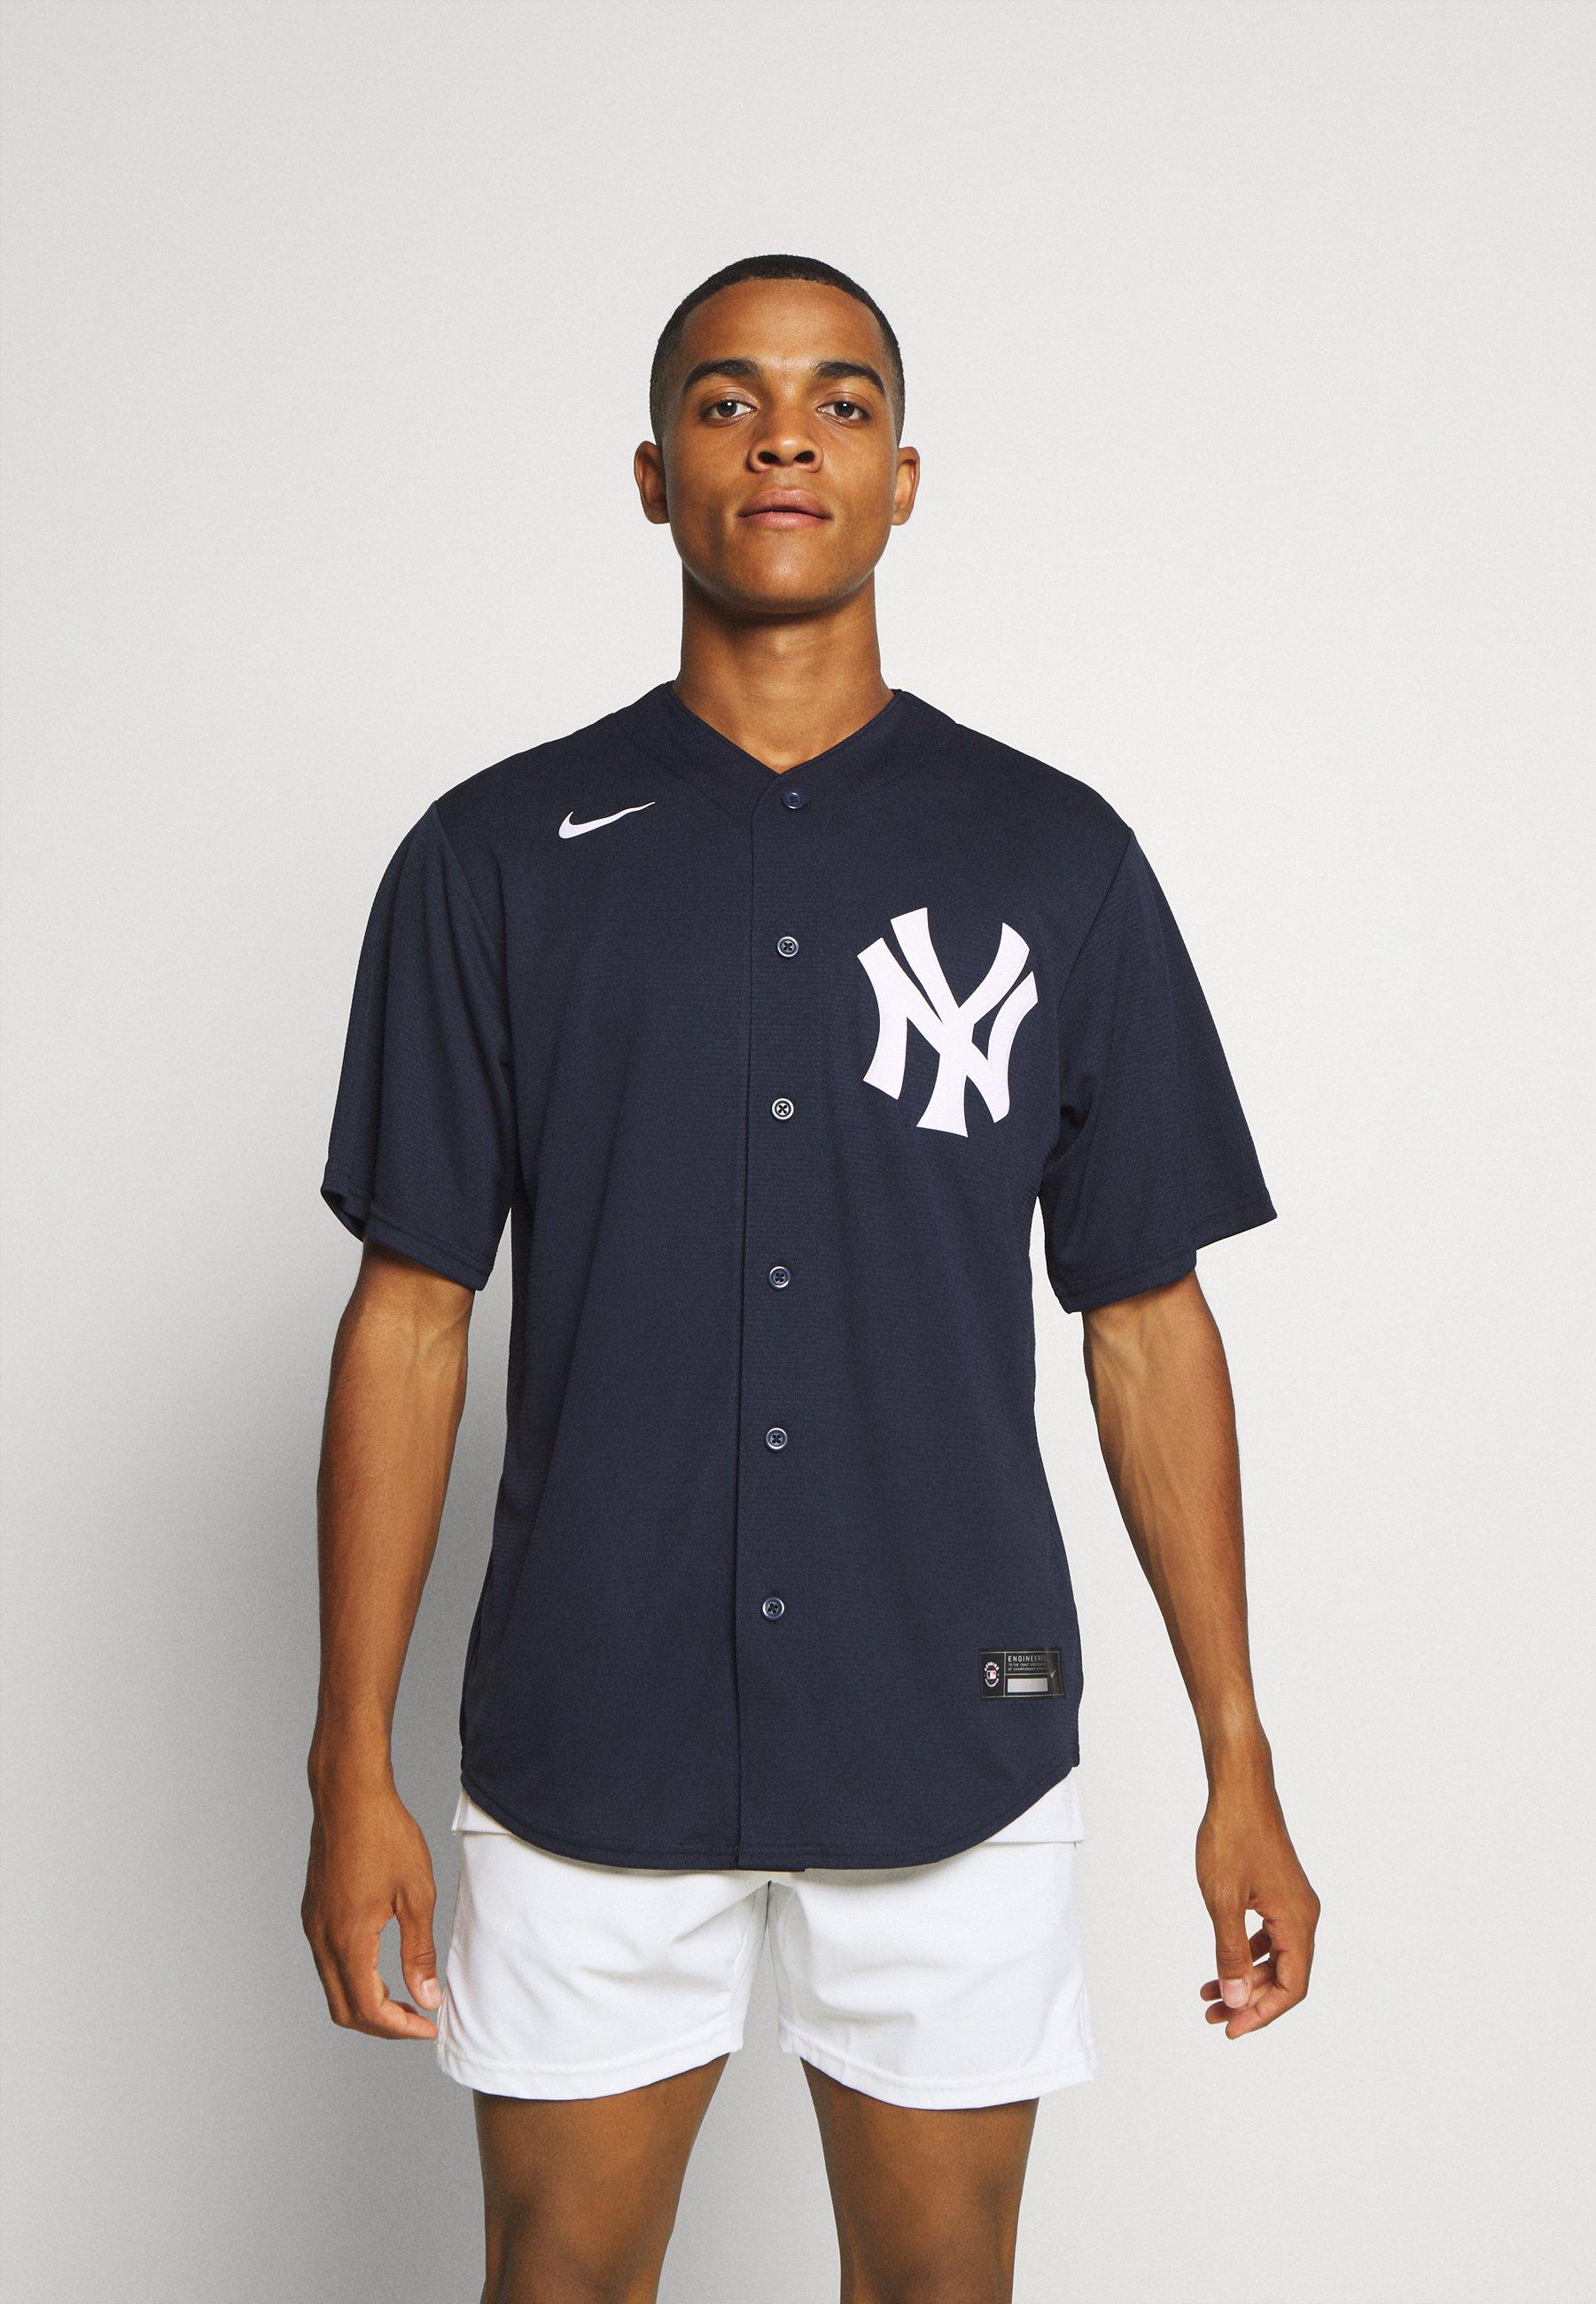 salir No quiero Intolerable  Nike Performance MLB NEW YORK YANKEES OFFICIAL REPLICA HOME - Equipación de  clubes - team dark navy/azul marino - Zalando.es